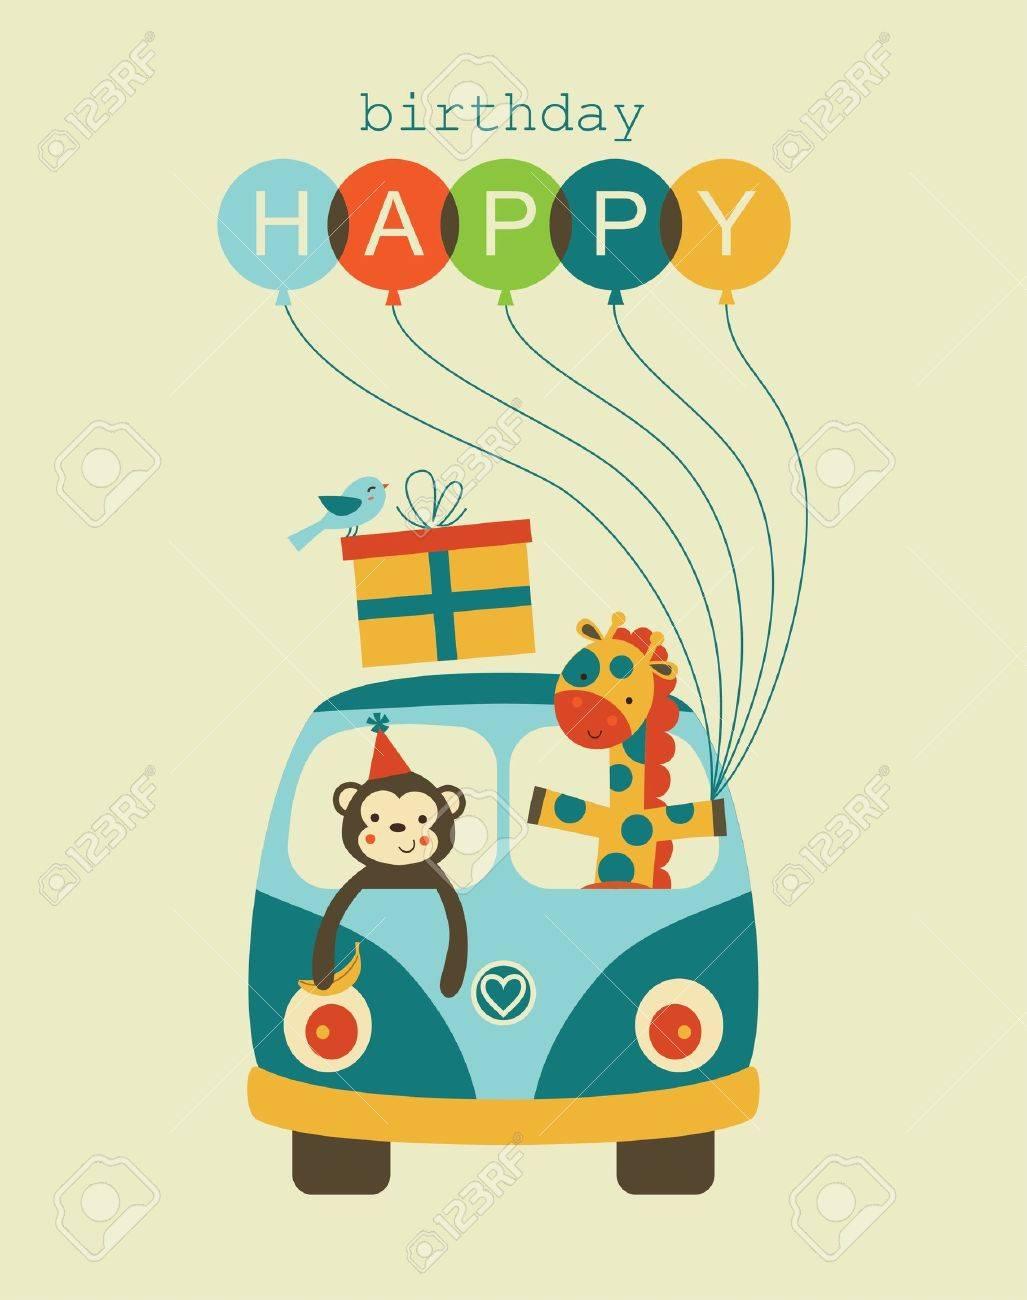 fun happy birthday card design. royalty free cliparts, vectors, Birthday card